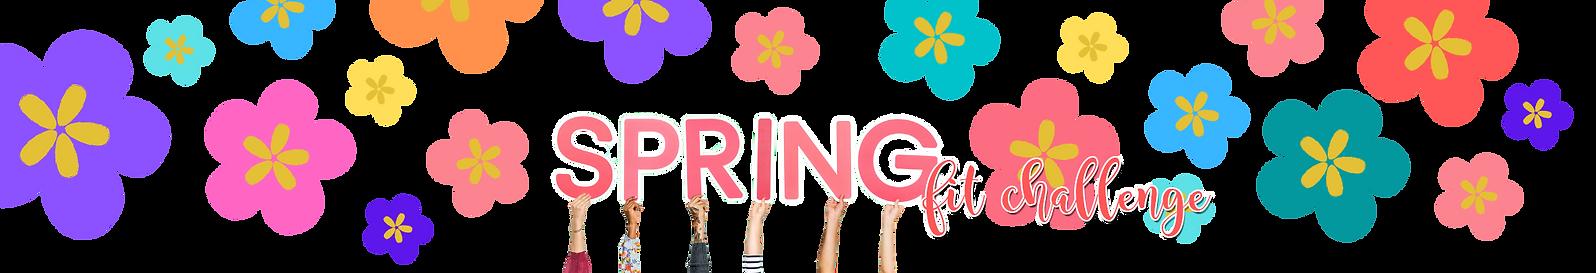 spring_fit_logo.png